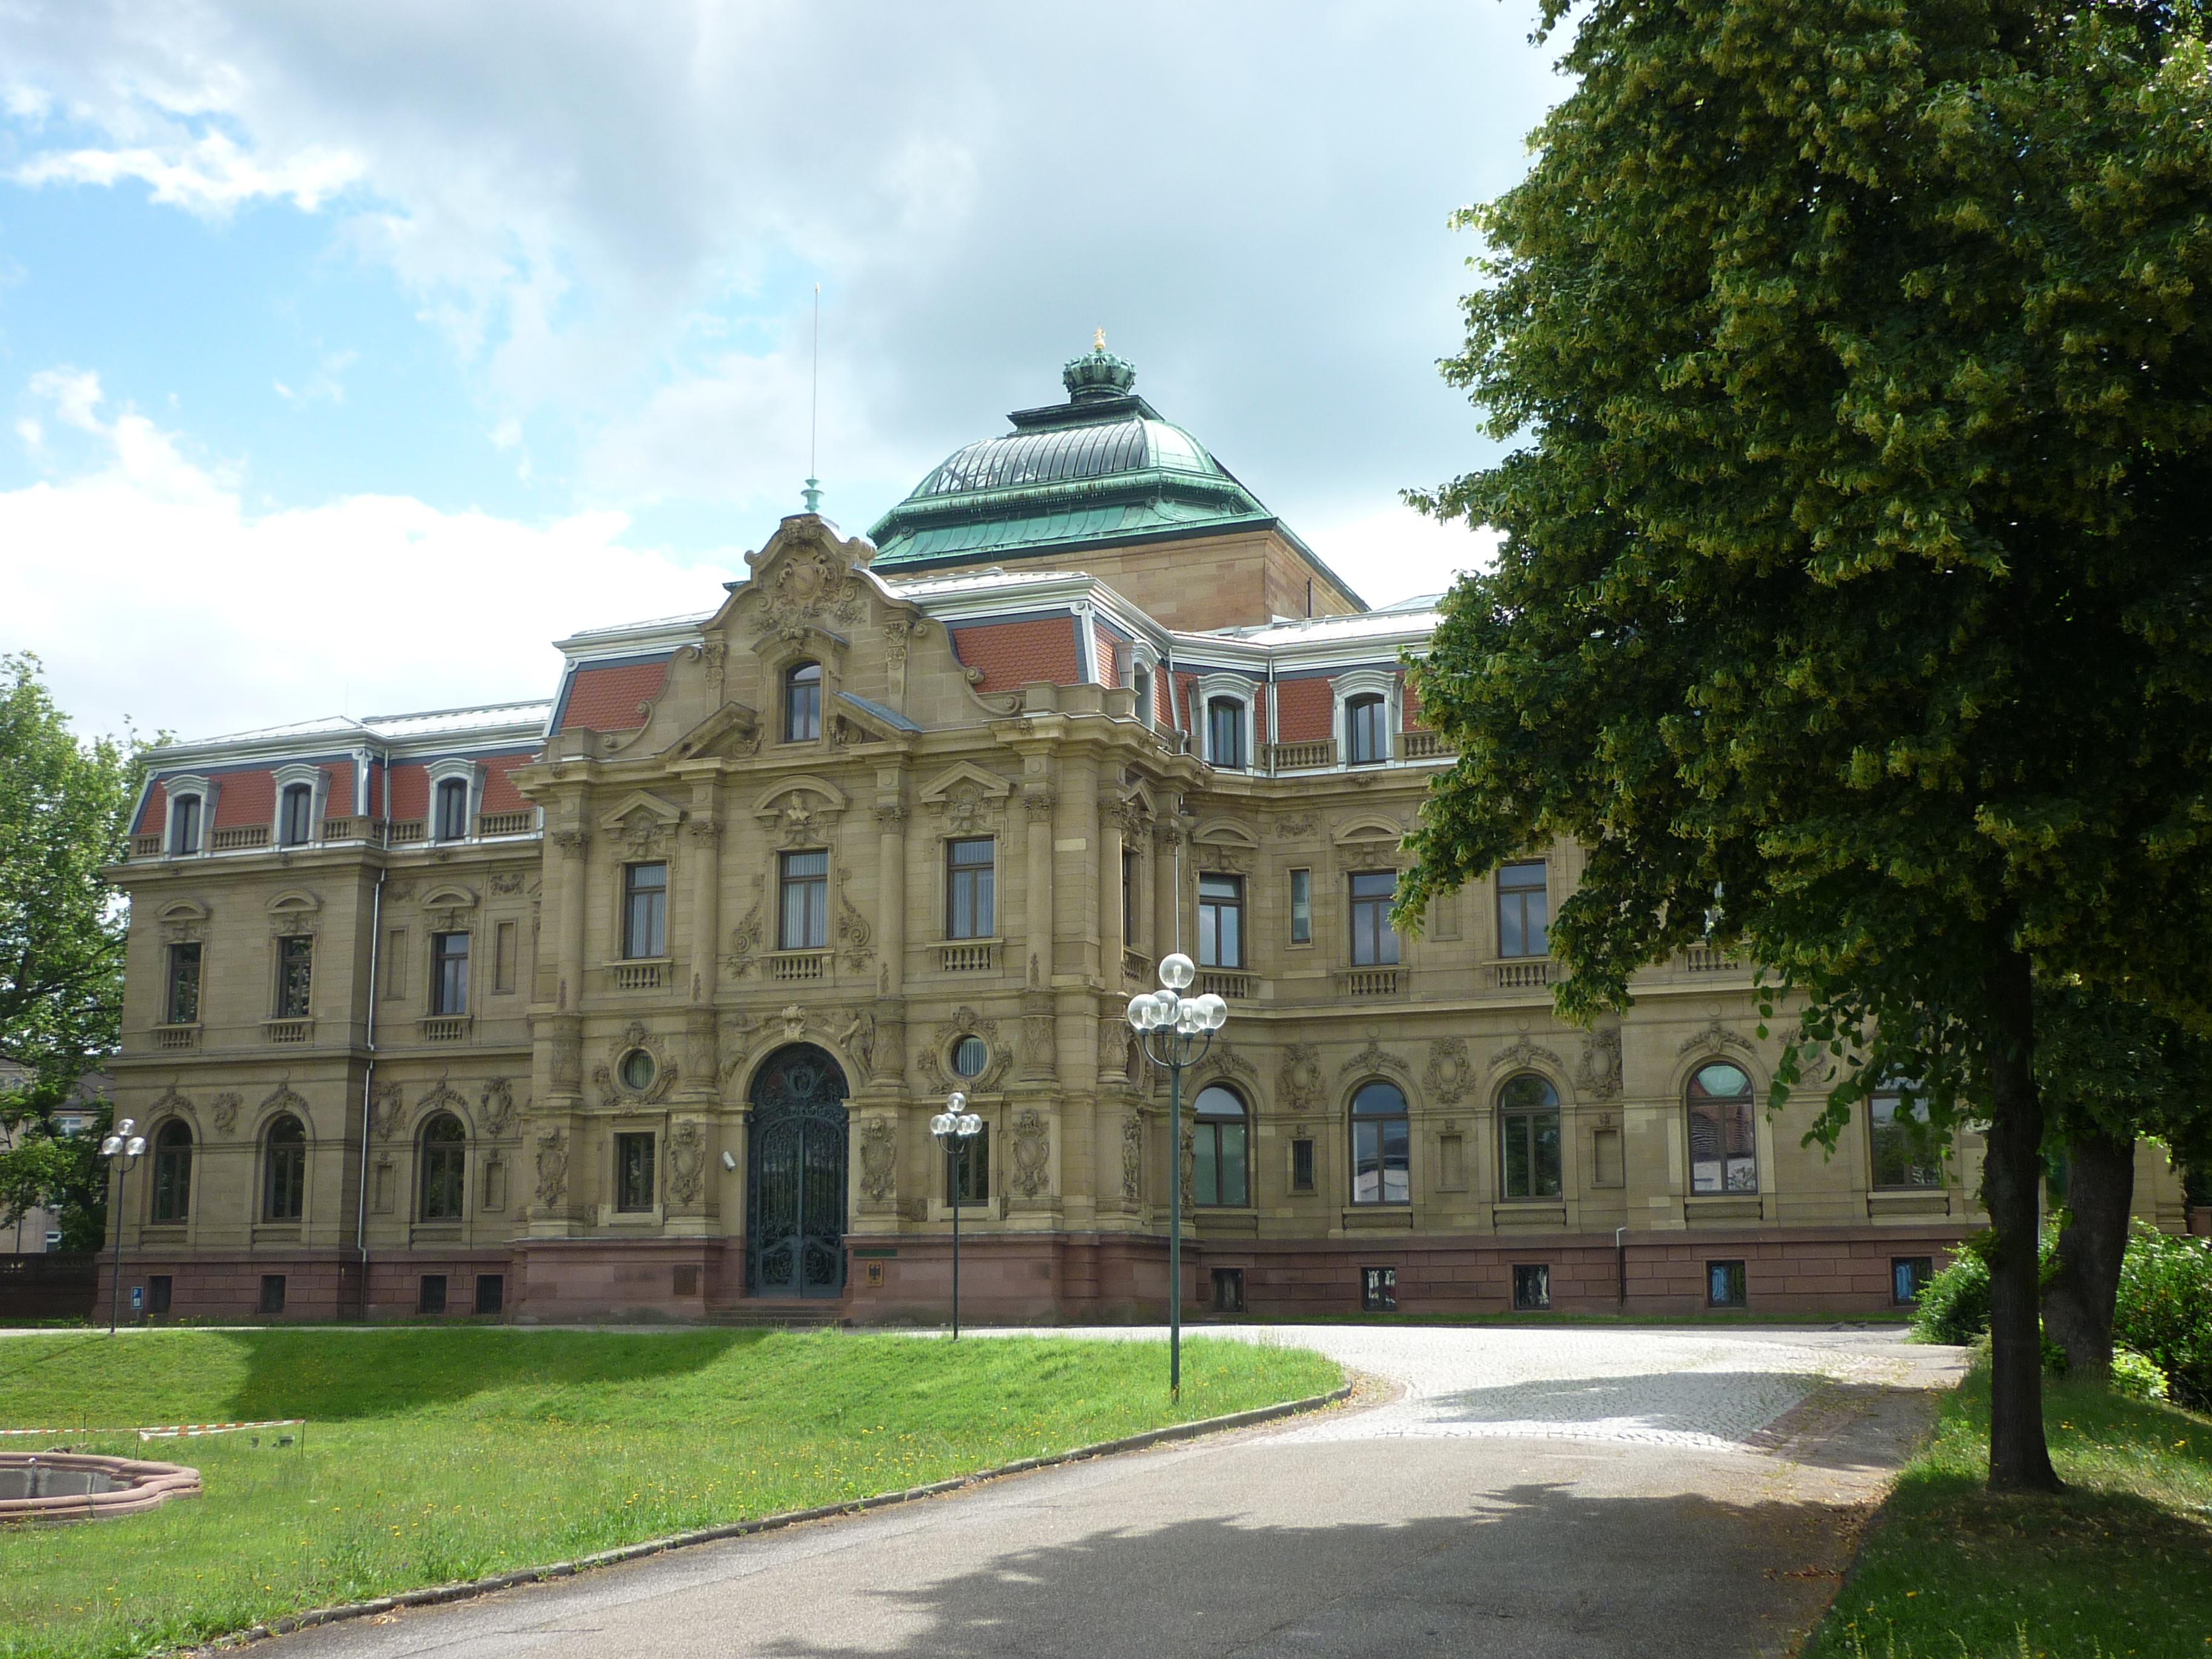 Hauptgebäude des Bundesgerichtshof, Karlsruhe. Bild: ComQuat. Lizenz: Creative Commons BY-SA 3.0.